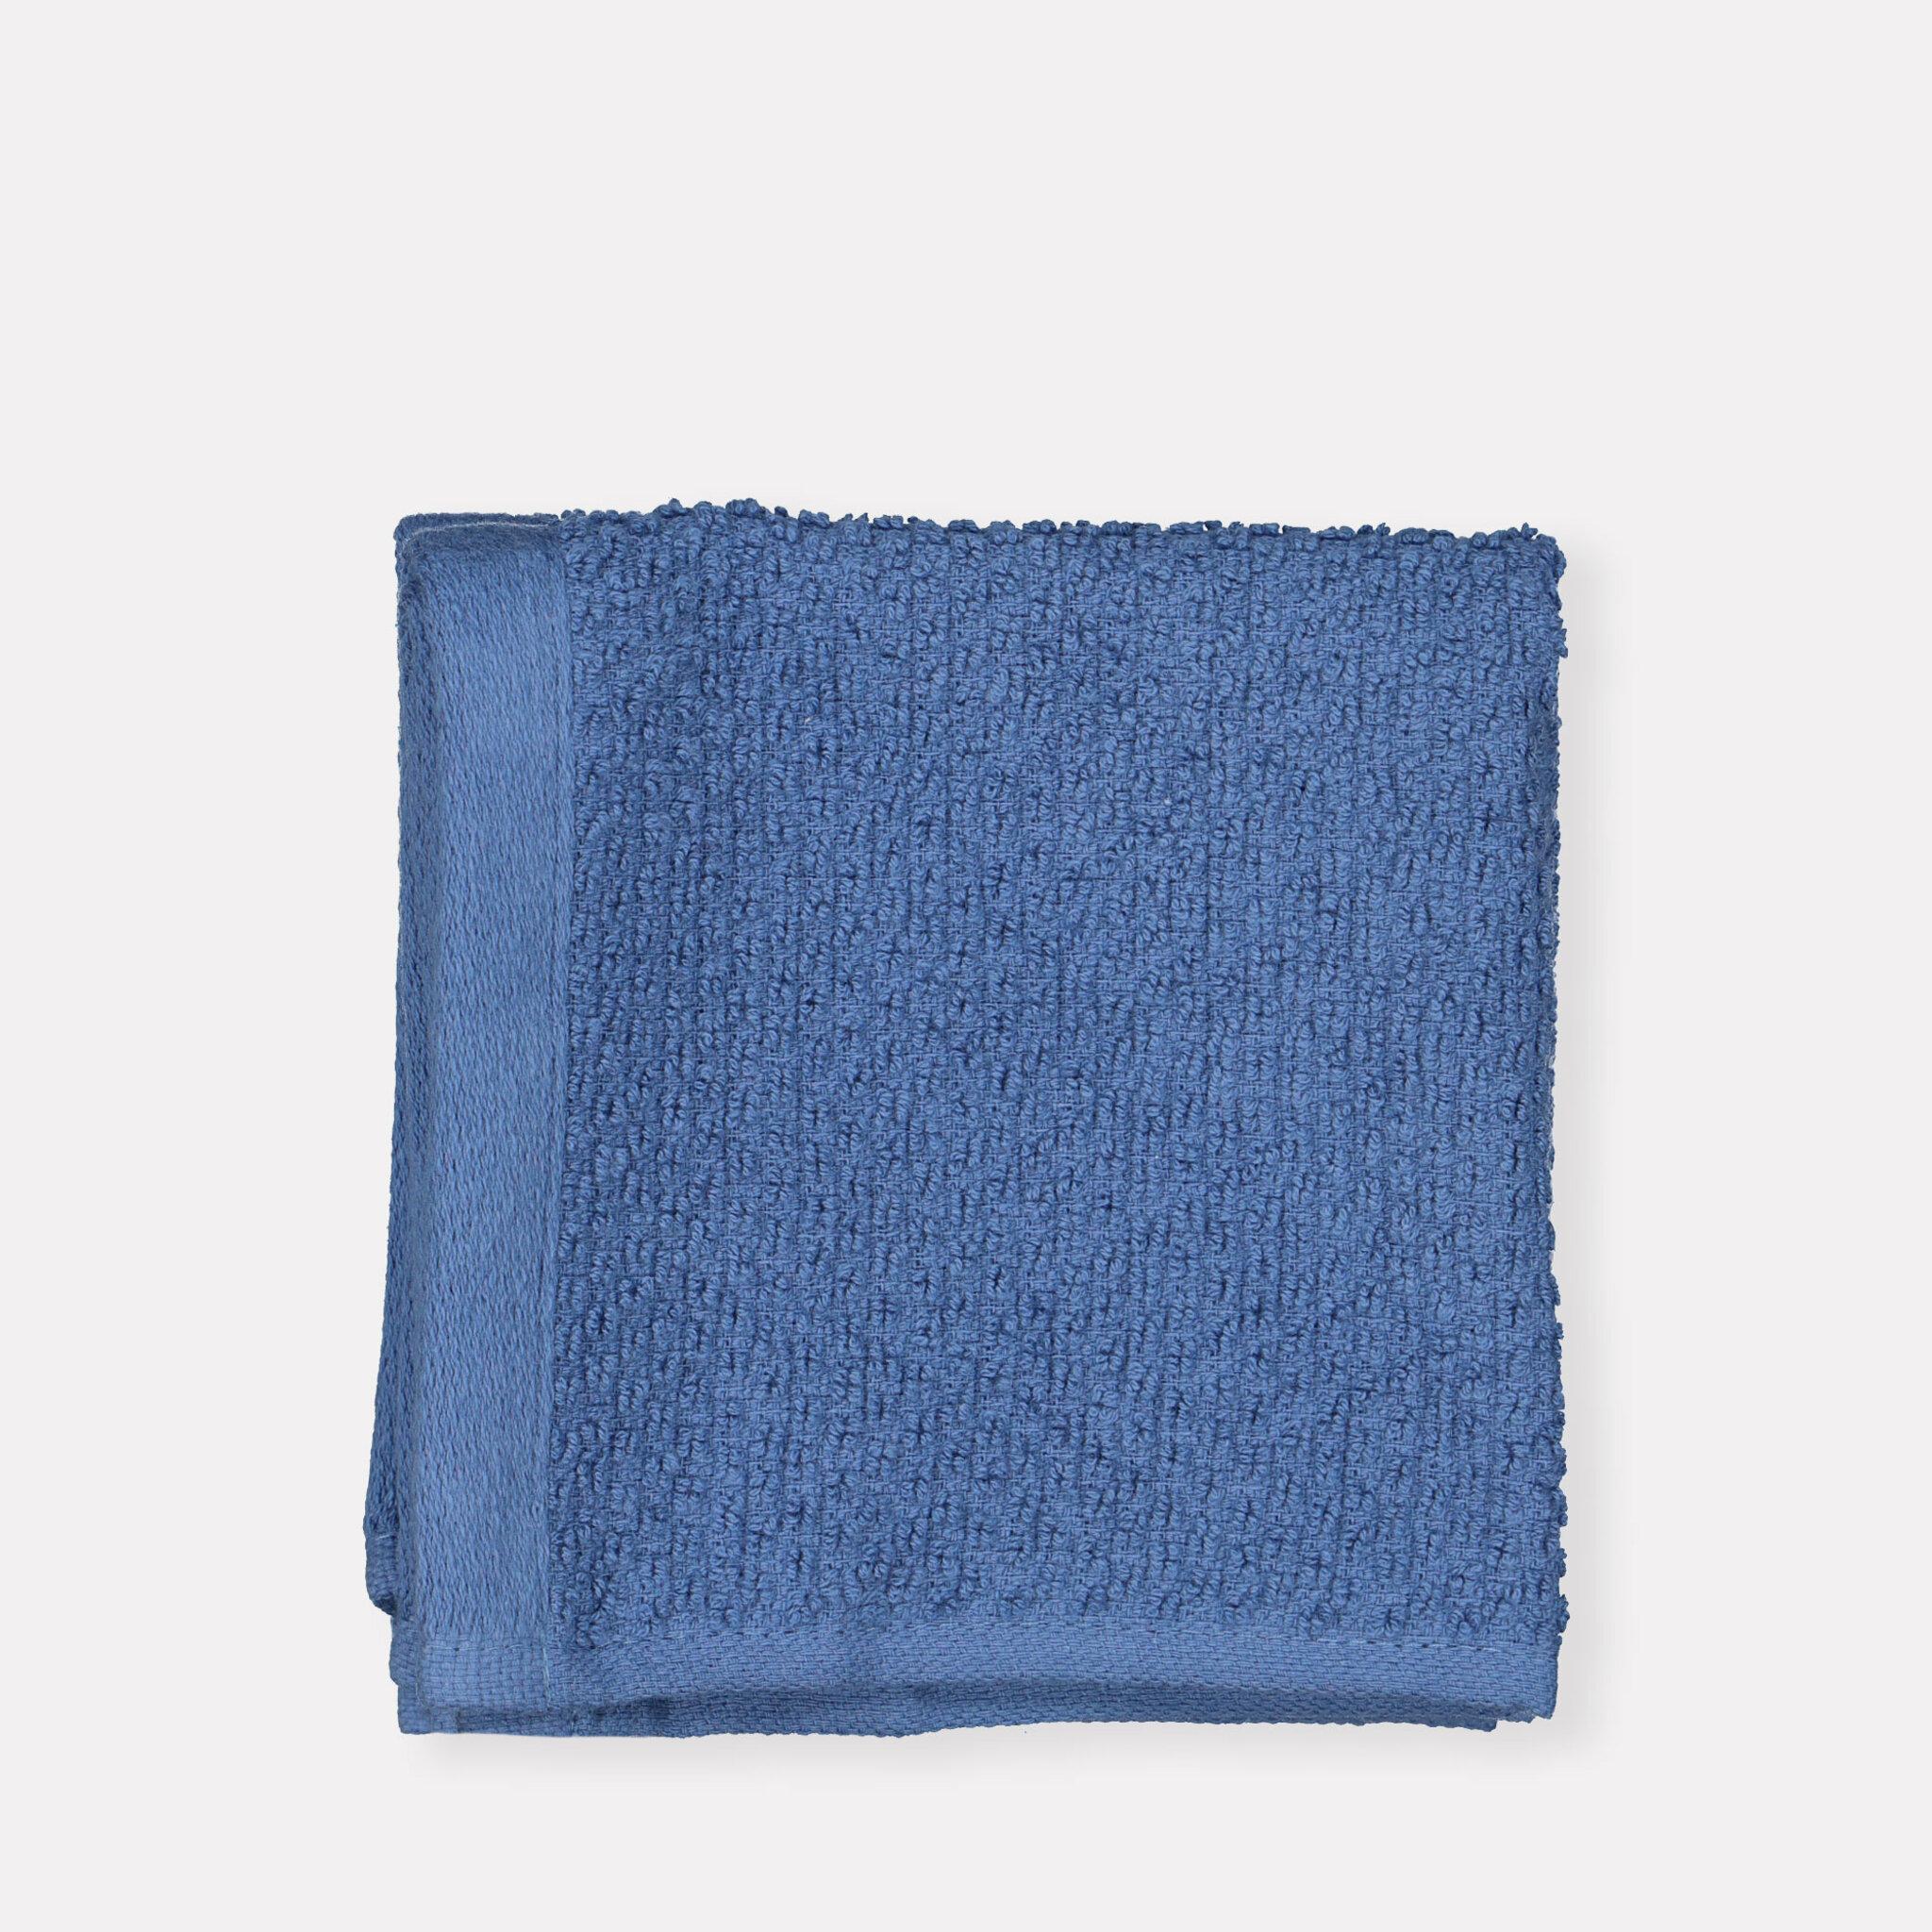 Handdukar 30x30 cm, 5 pack